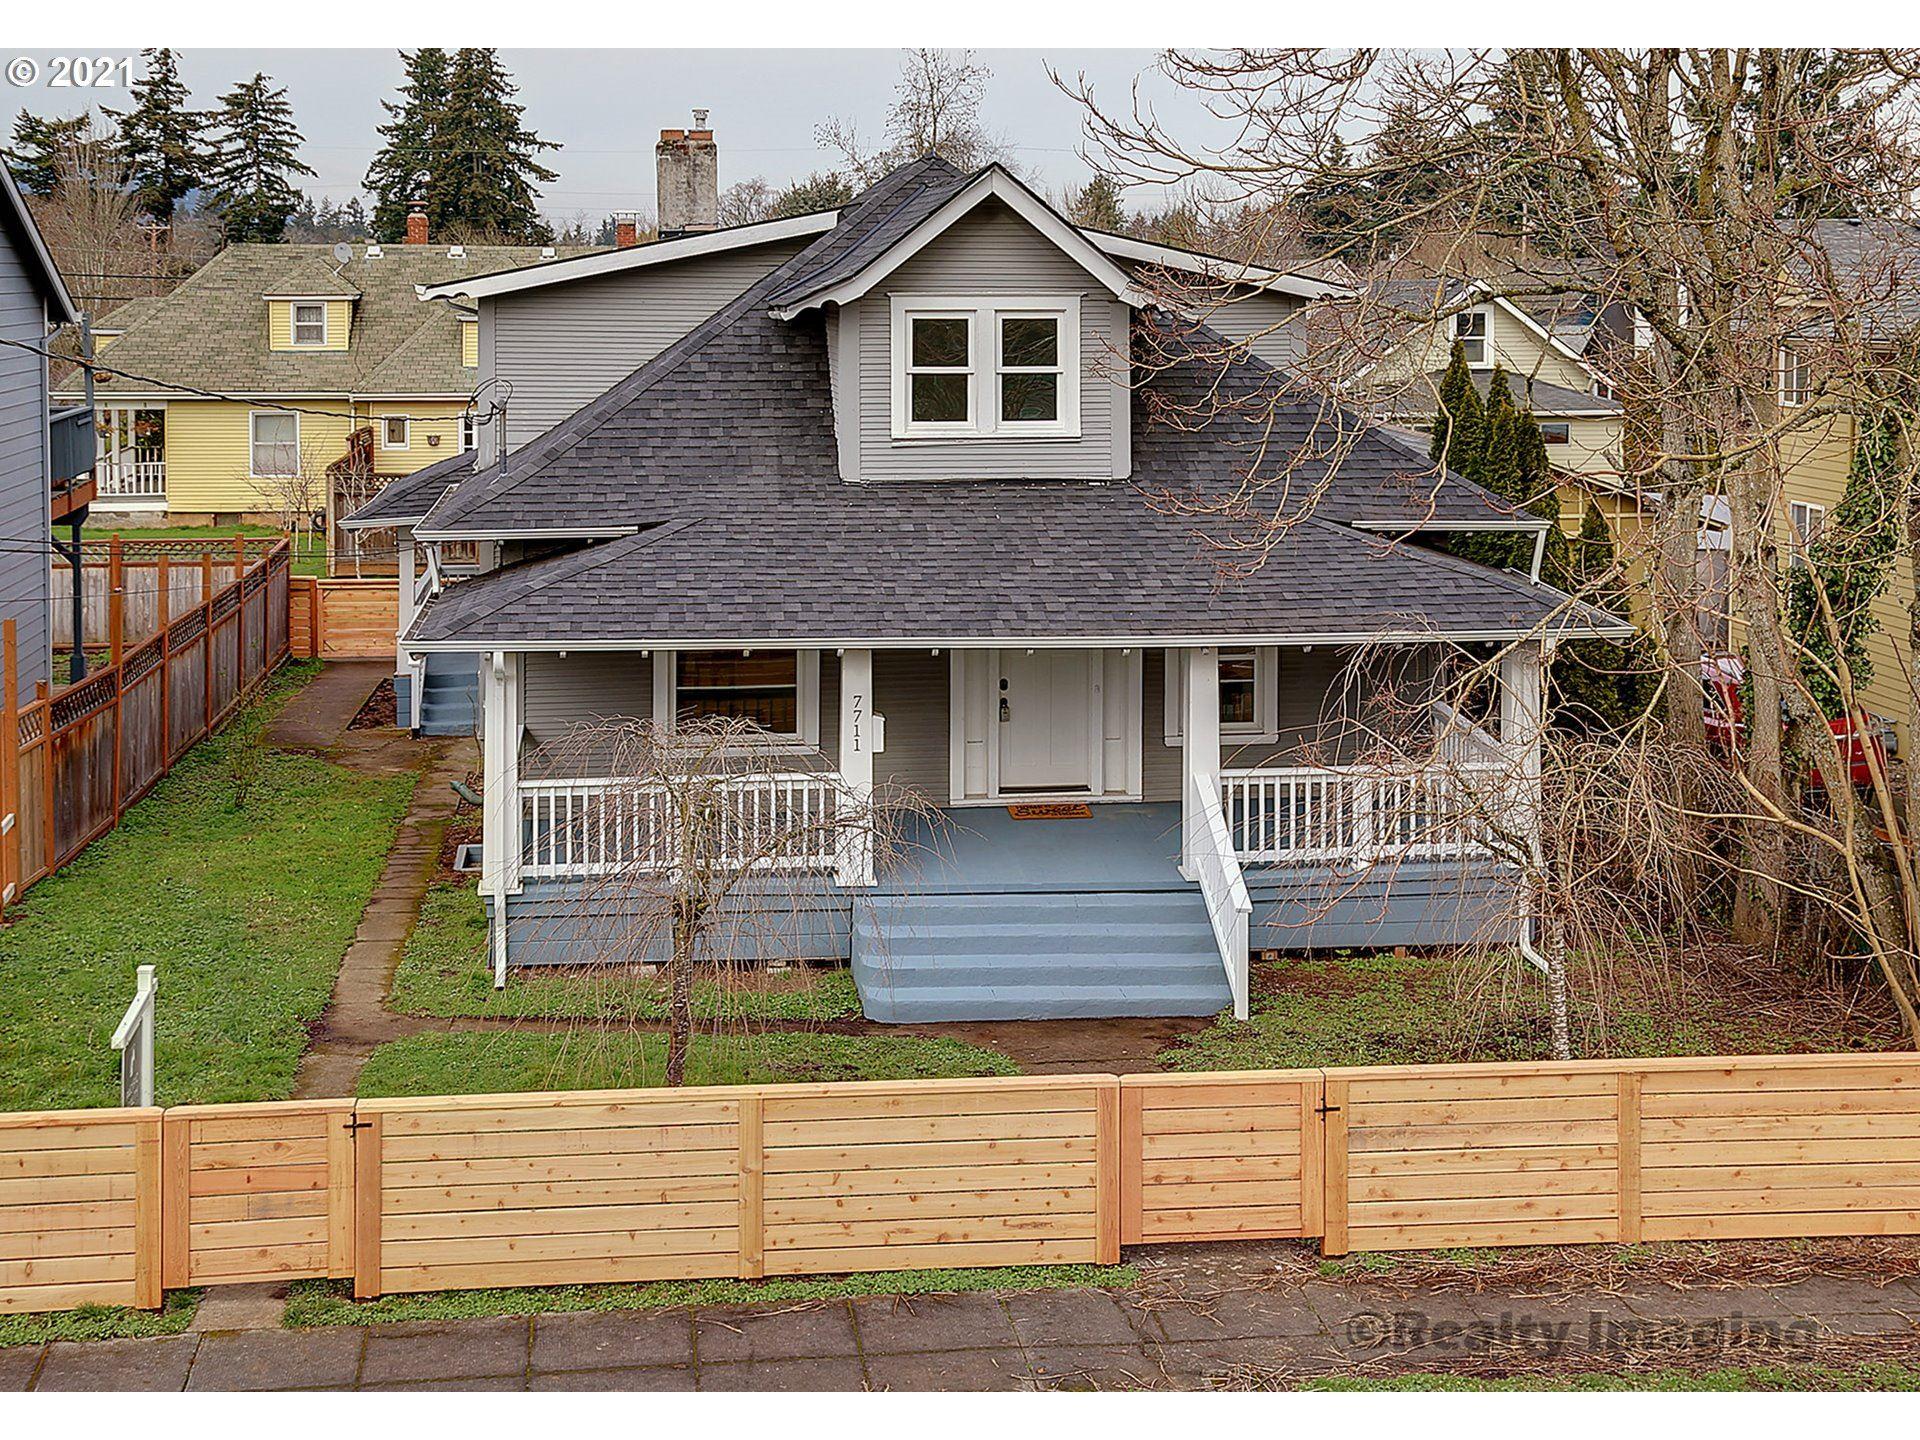 Photo for 7711 SE WOODSTOCK BLVD, Portland, OR 97206 (MLS # 21096219)